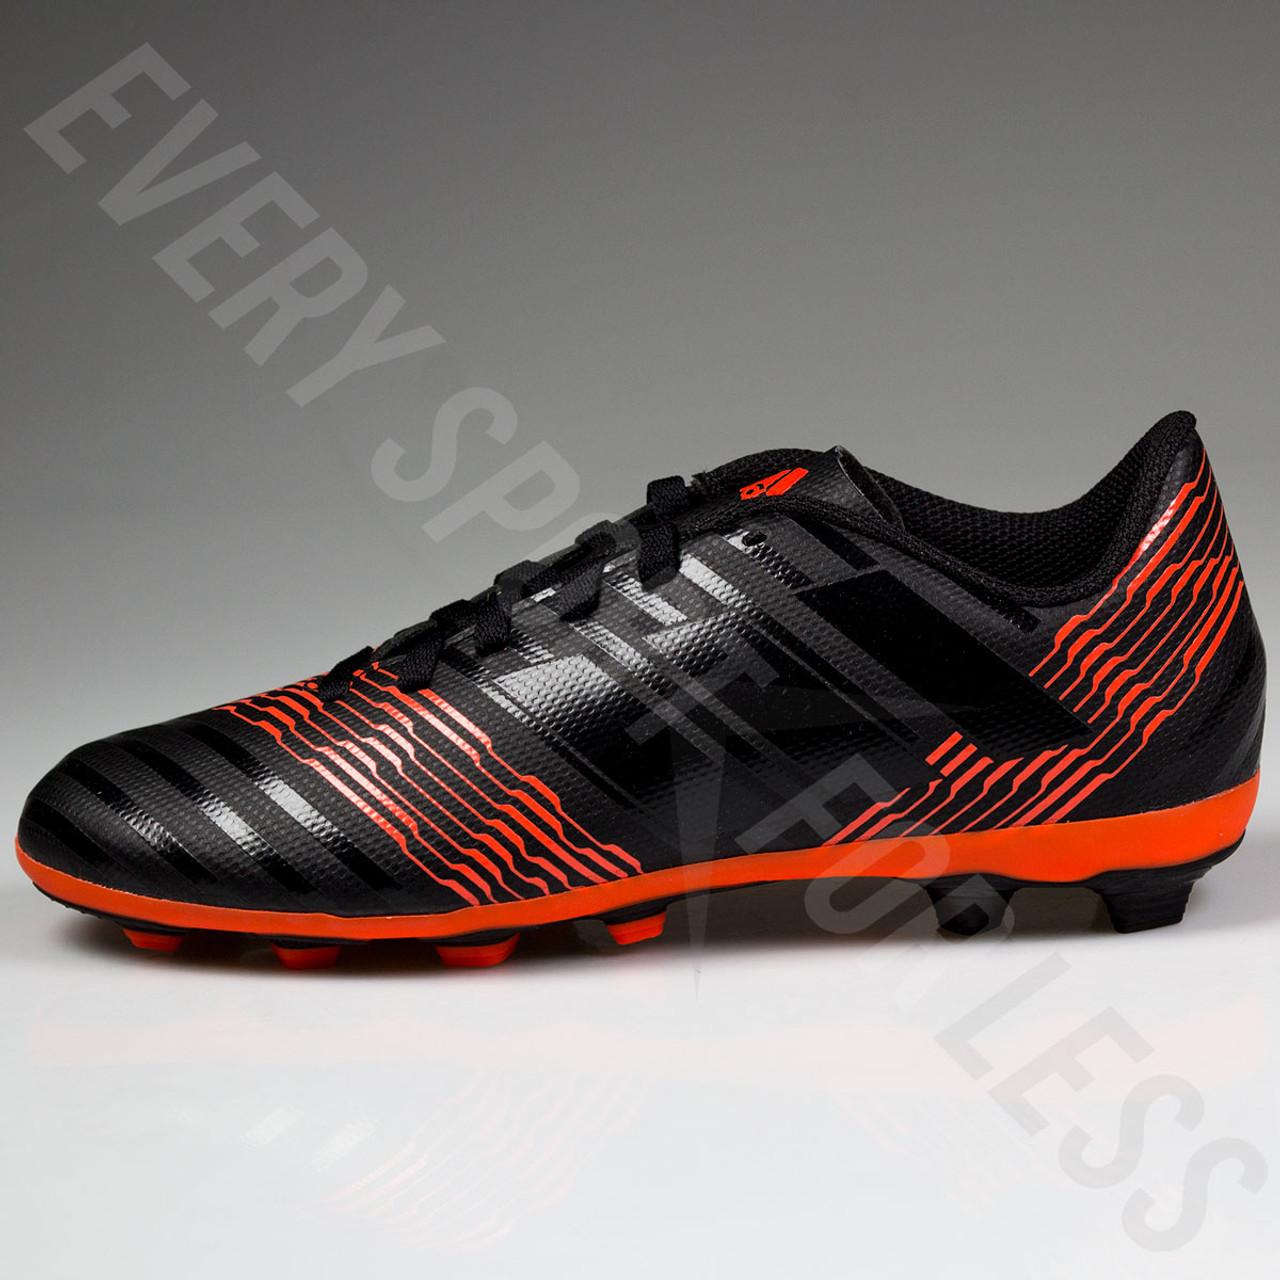 Adidas nemeziz FG youth soccer cleats cp9206 mejor precio